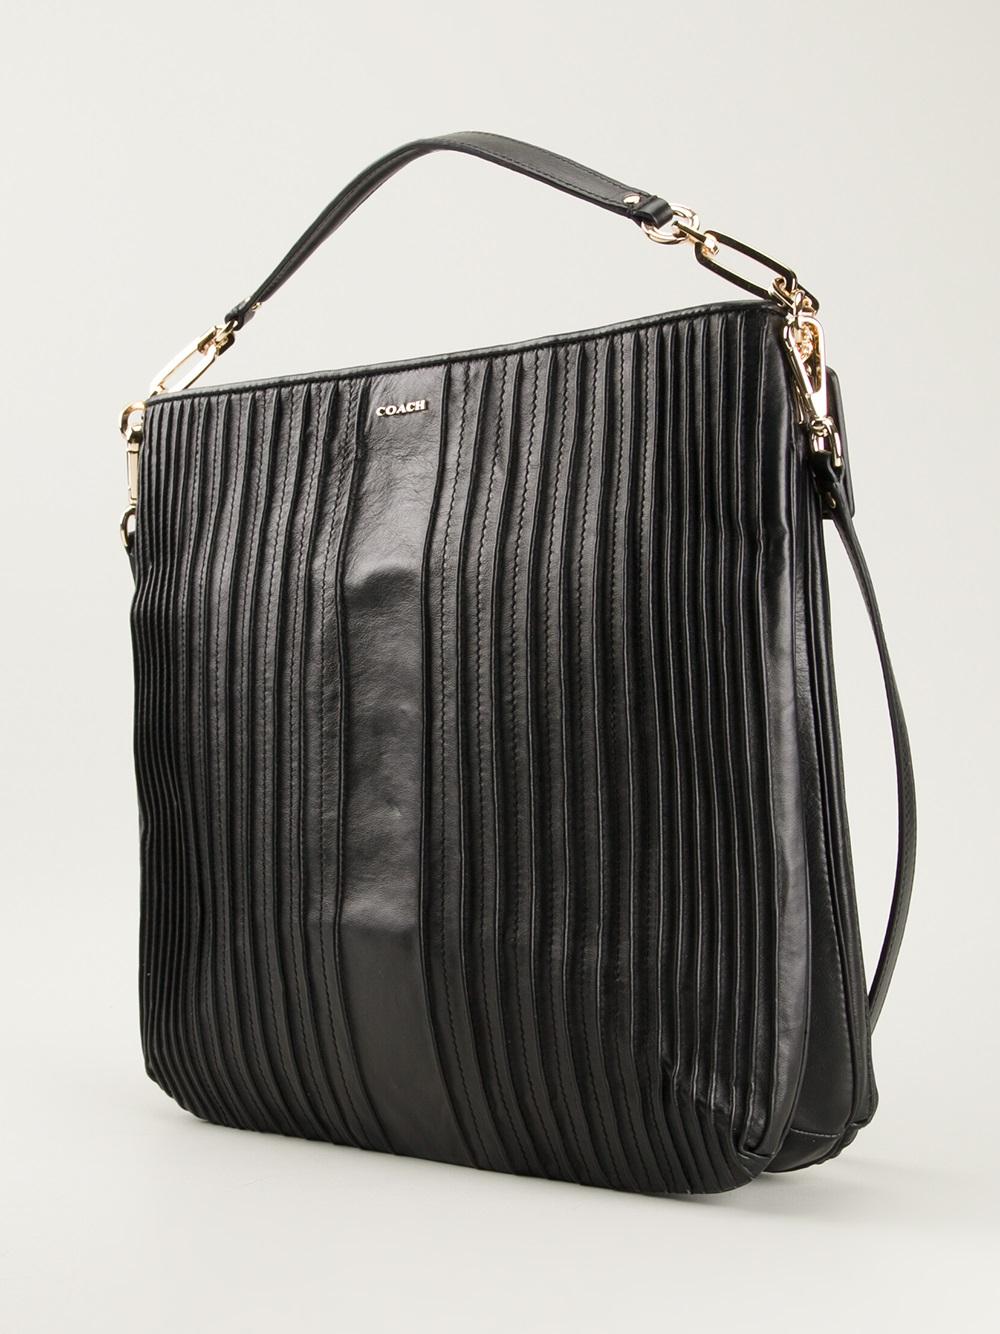 6a4eb4add03a Coach Madison Hobo Shoulder Bag in Black | Lyst. Saks Fifth Avenue Chanel  Bags - Coach ...